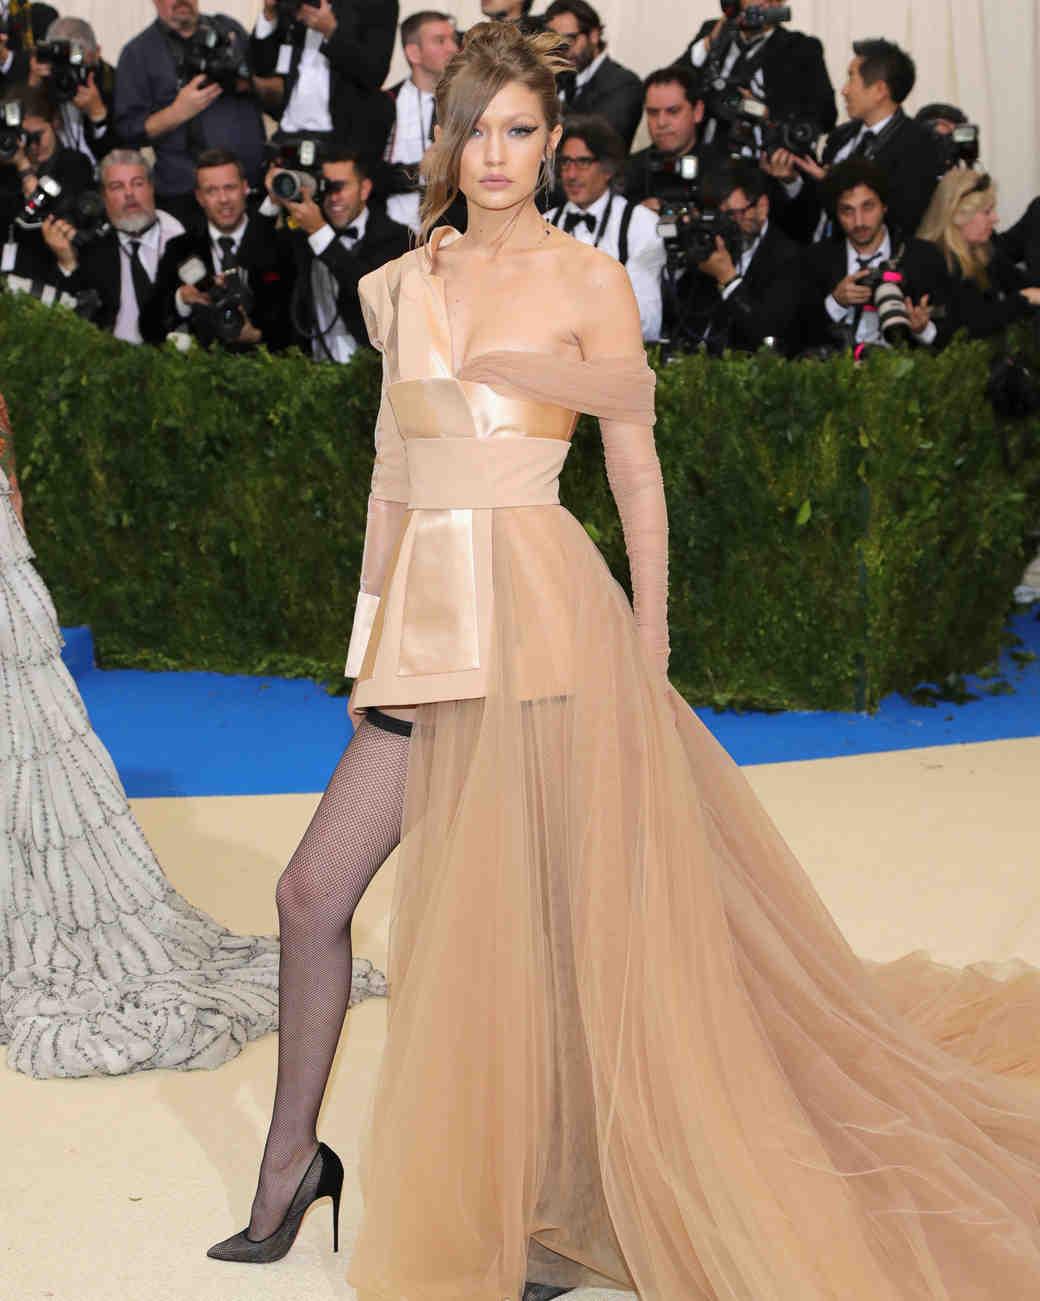 Gigi Hadid Met Gala 2017 Dress